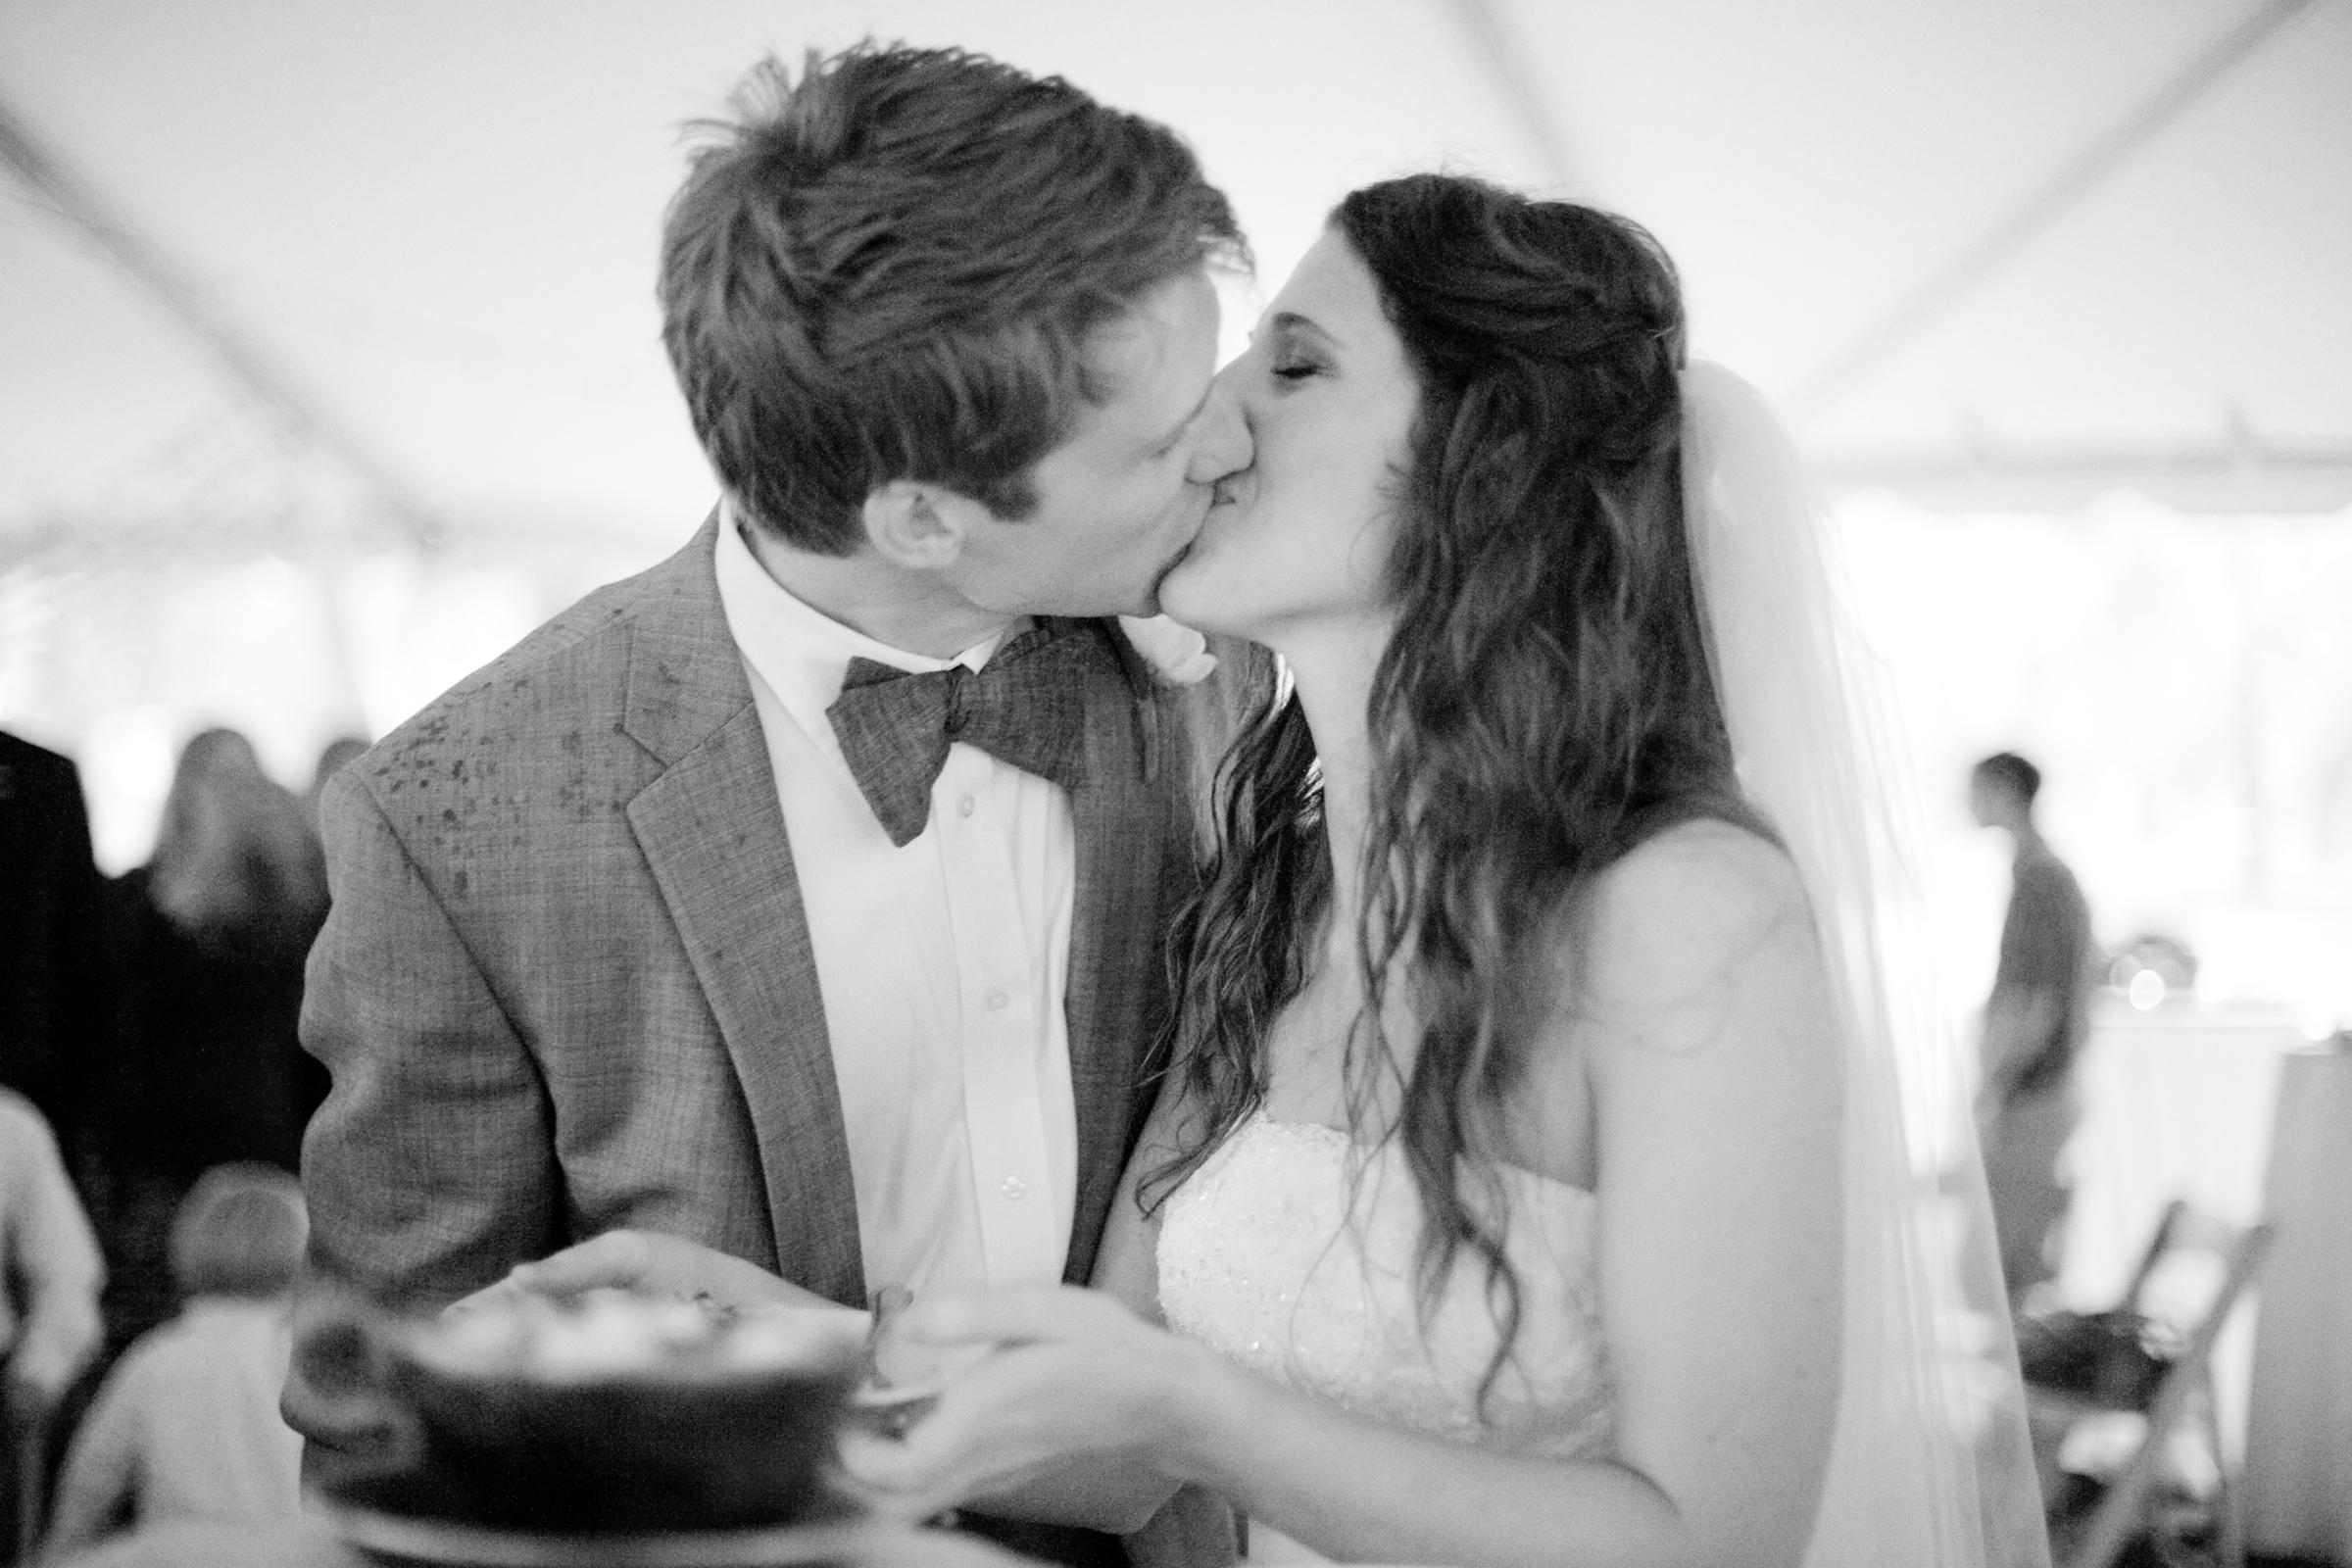 st_simons_island_wedding_photographer_shannon_griffin_0039.jpg